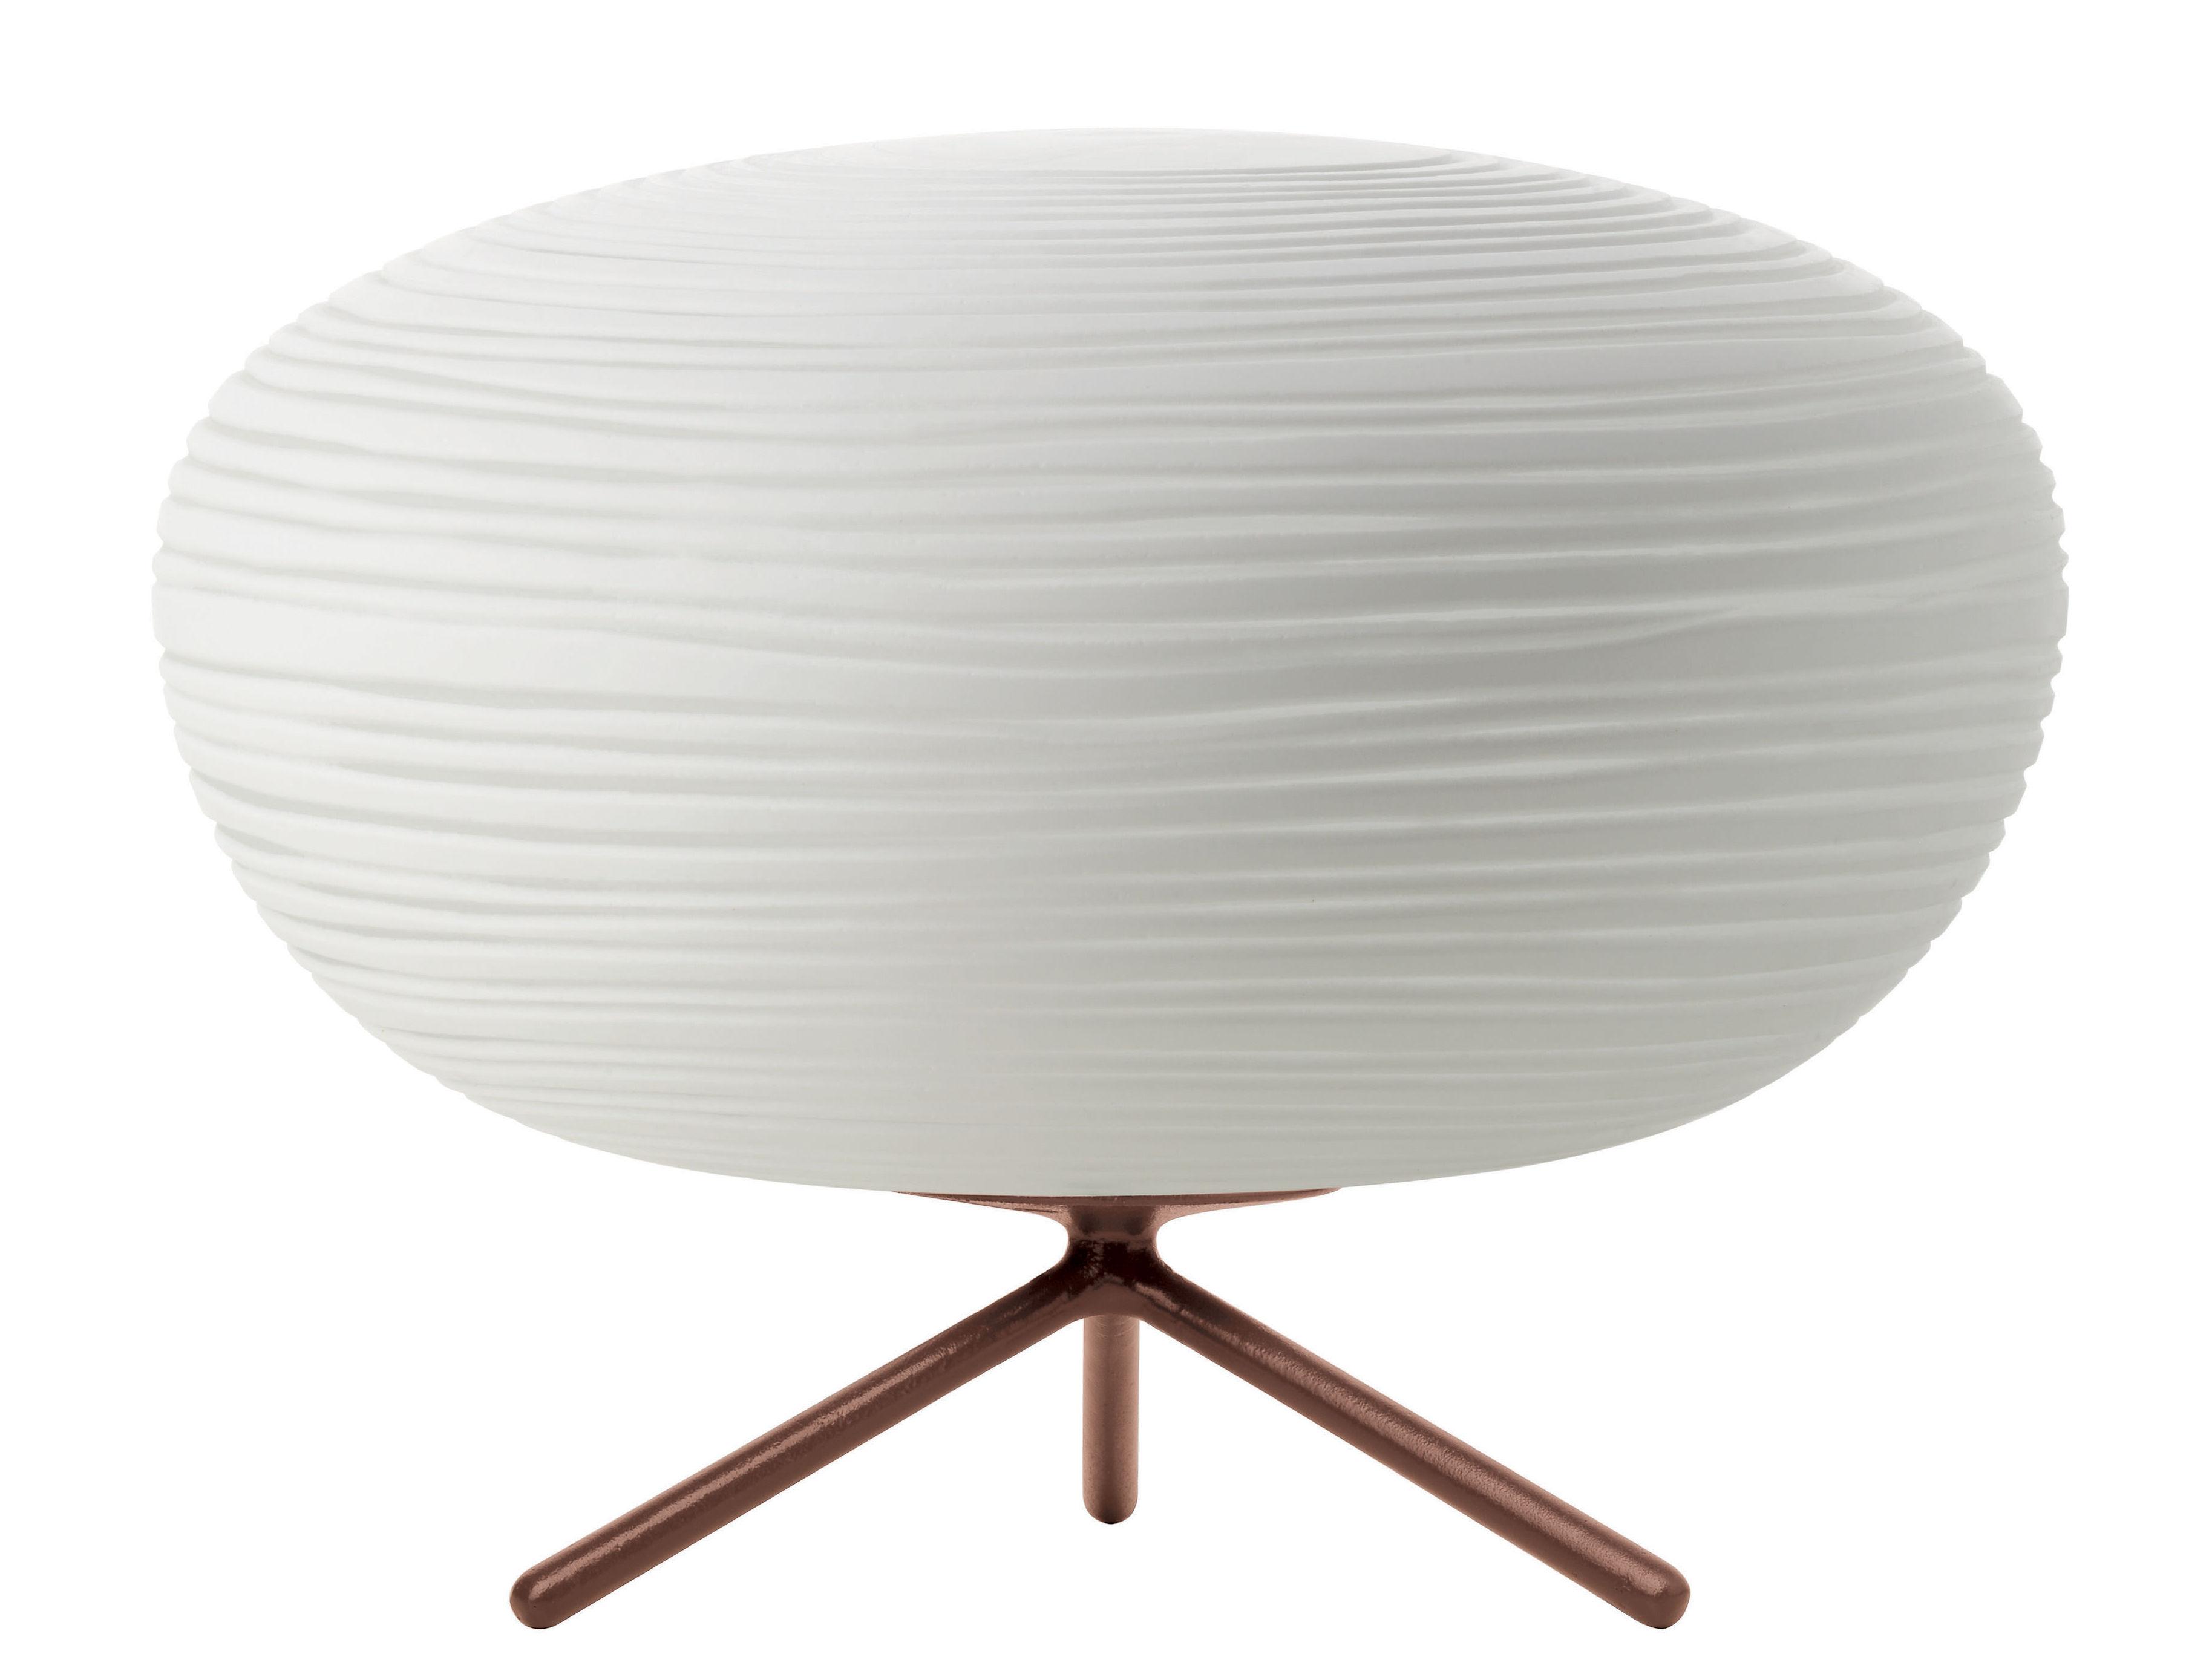 Ø X Lampe Rituals Table De 2 H 34 Cm Foscarini 25 nv8wONym0